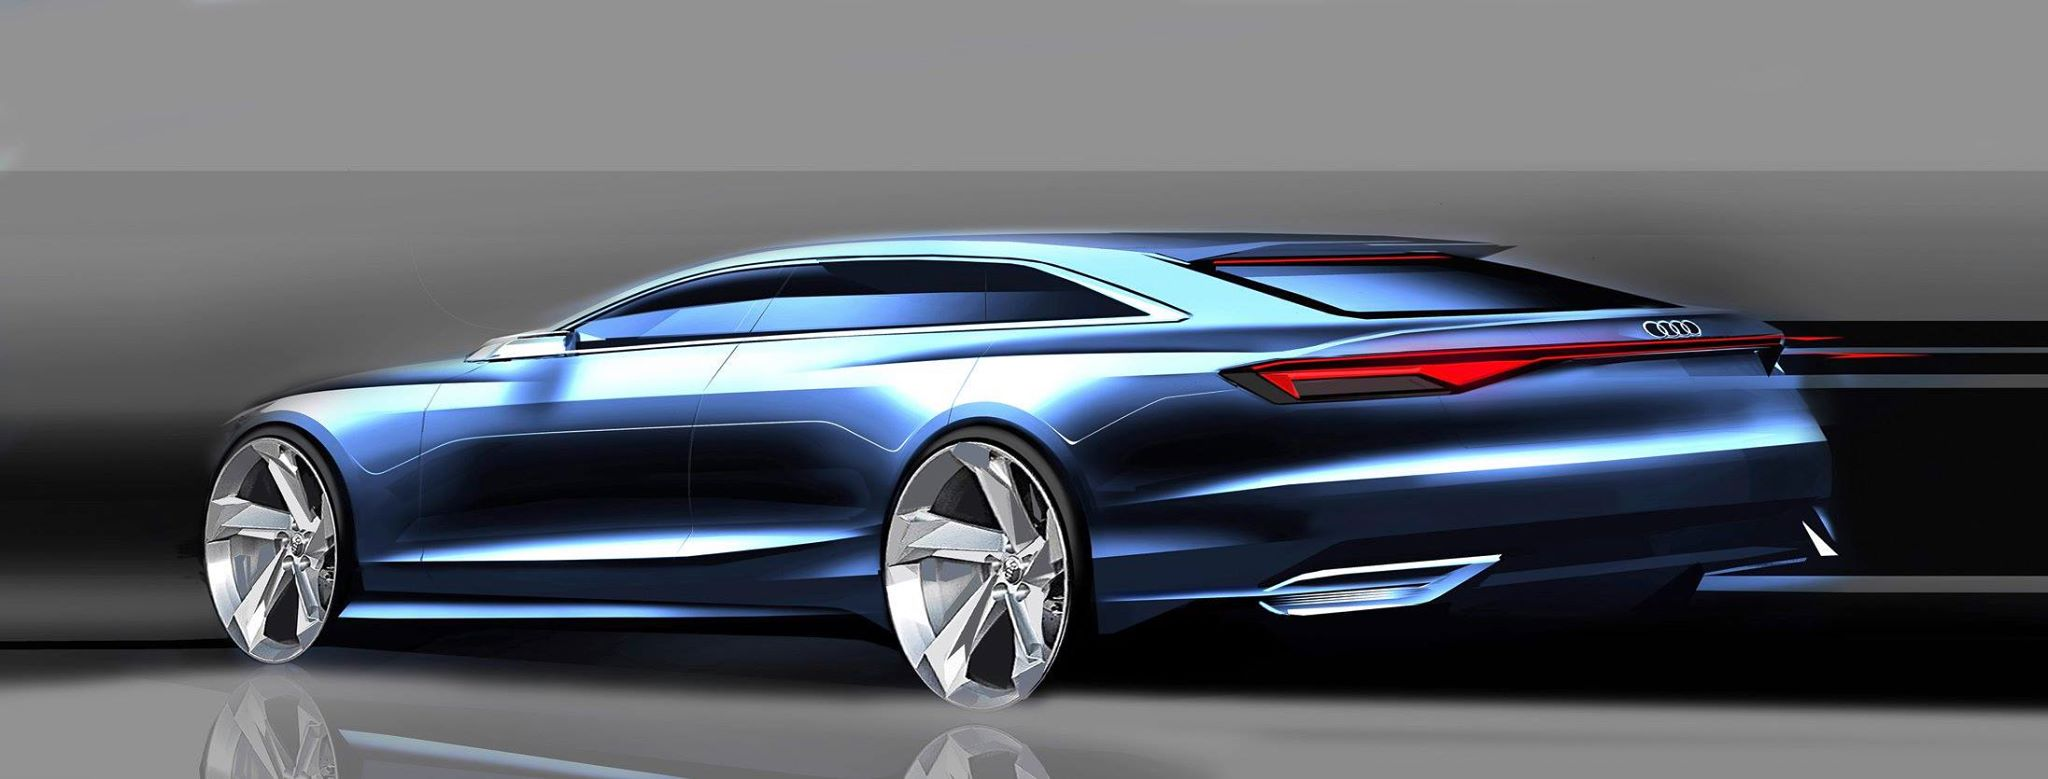 Audi Prologue Avant Concept Is Now Official for Geneva ...